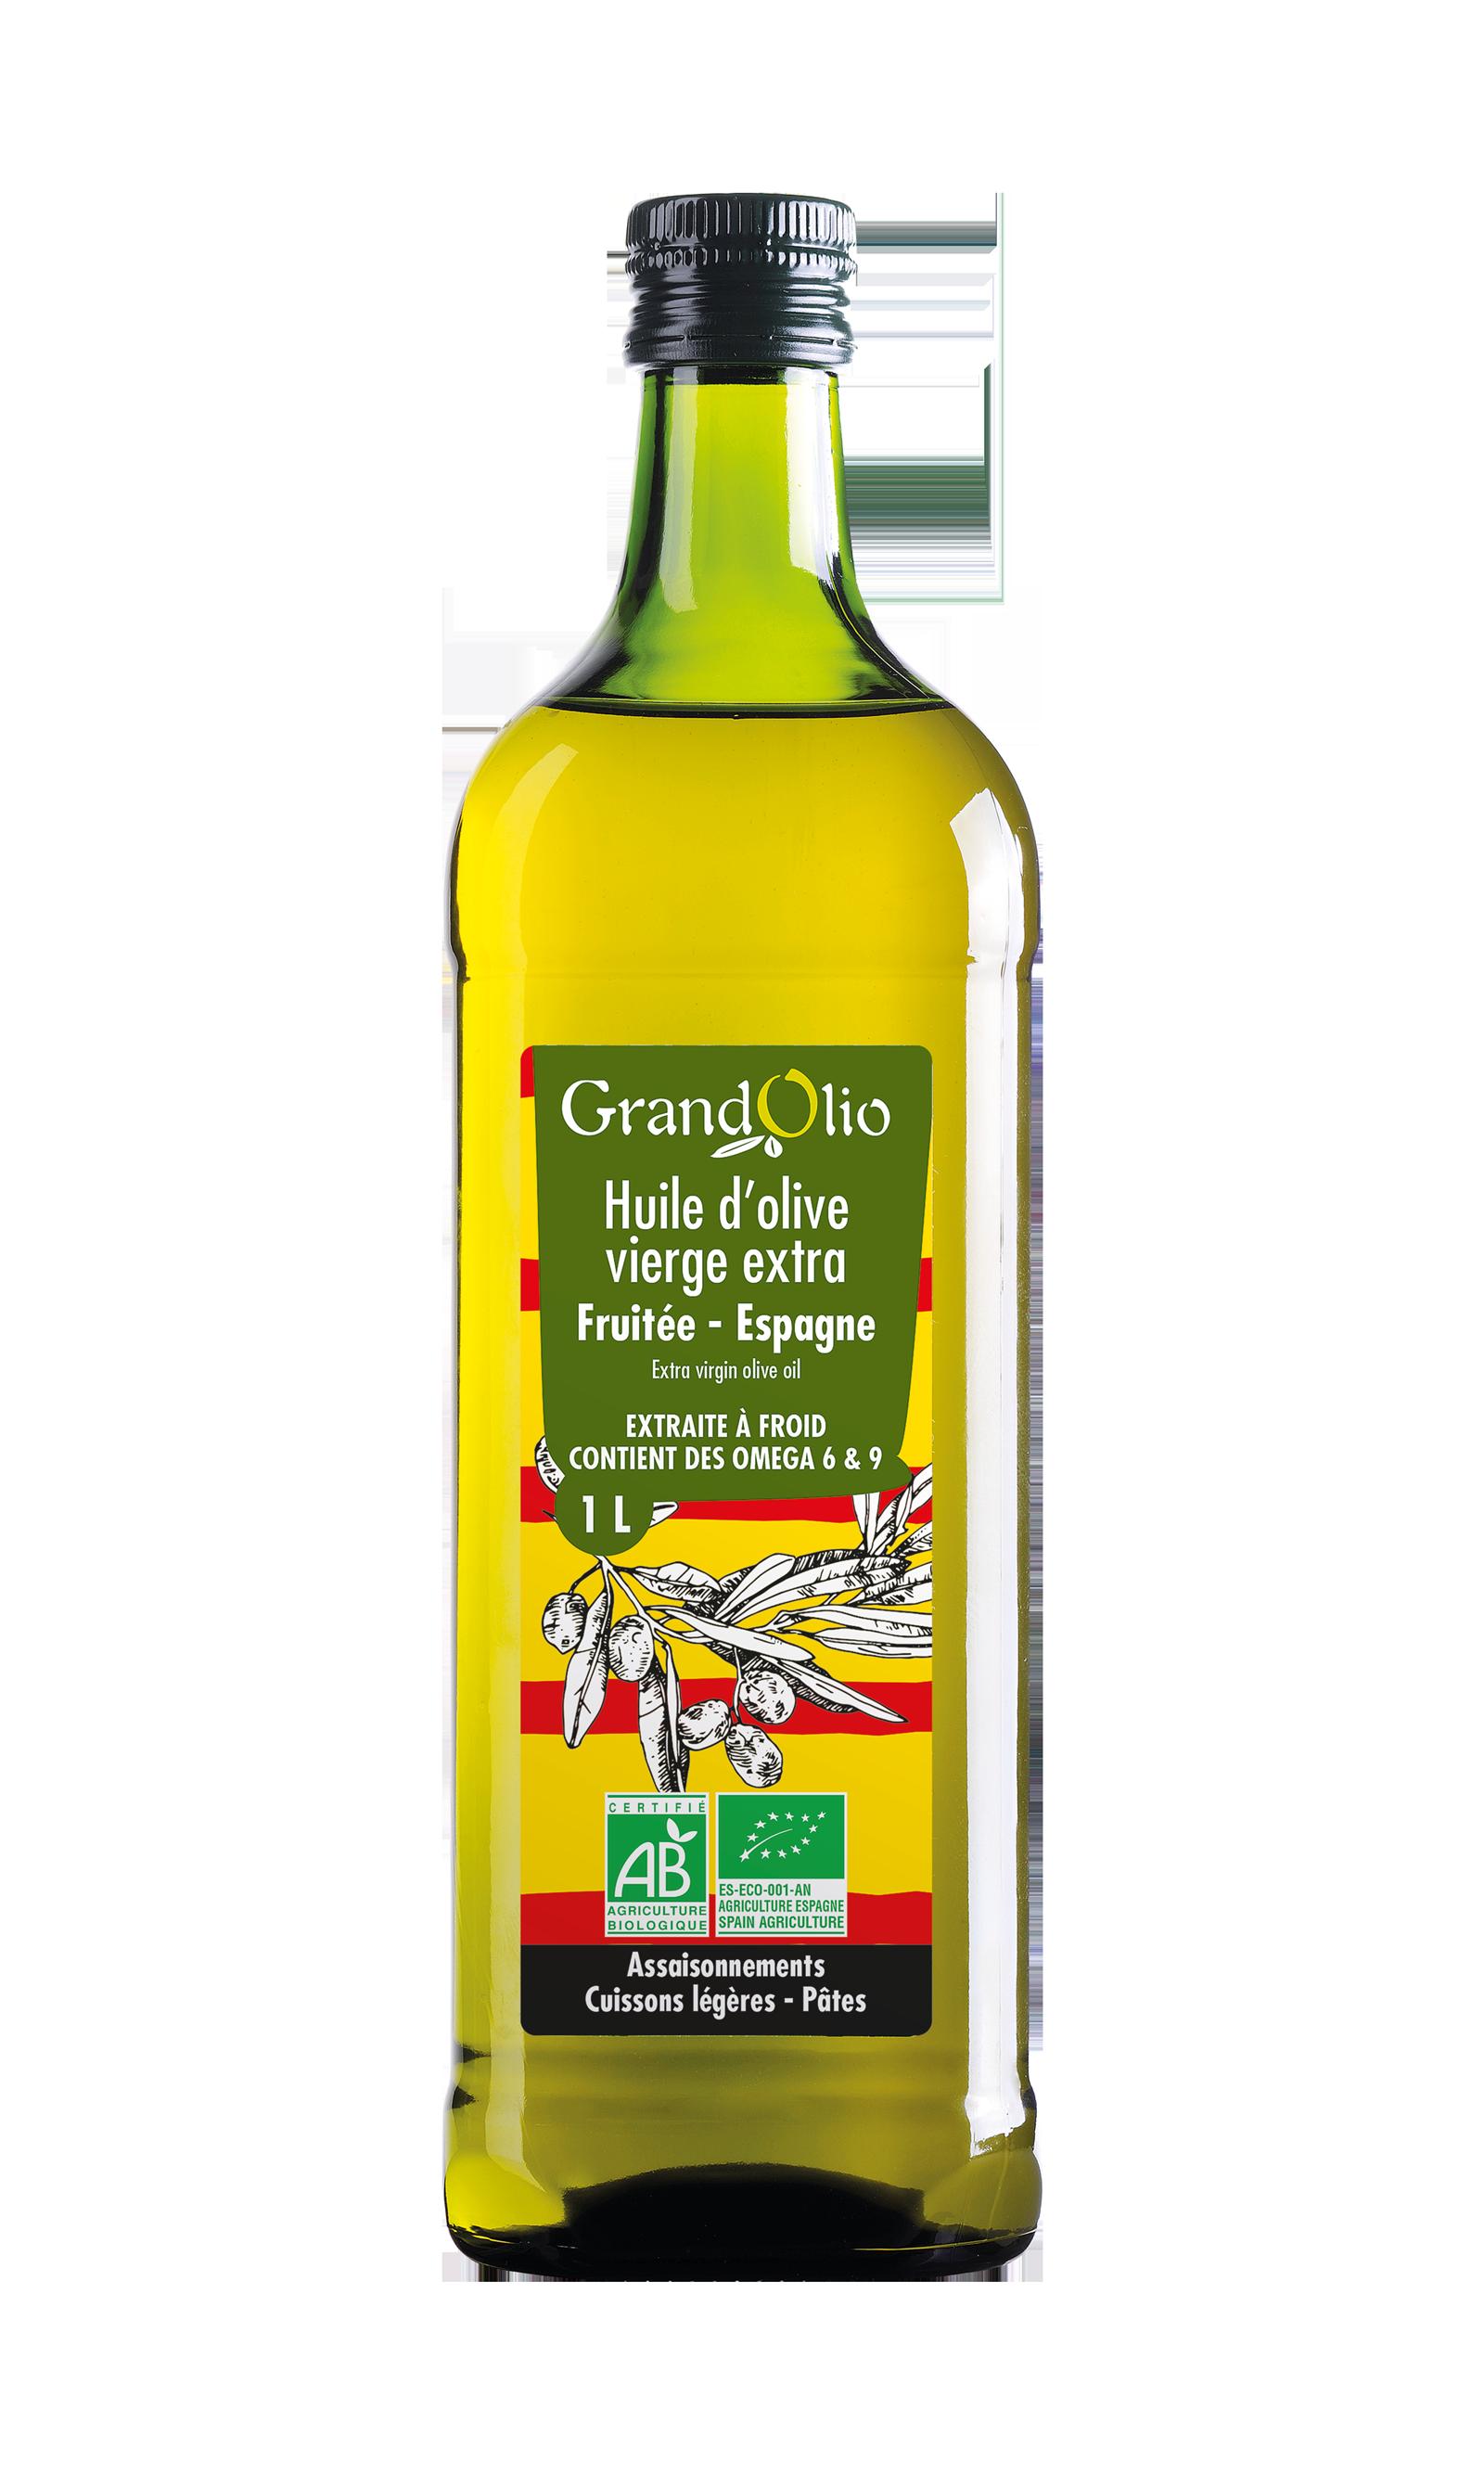 Olive 100% Espagne - fruitée vierge extra